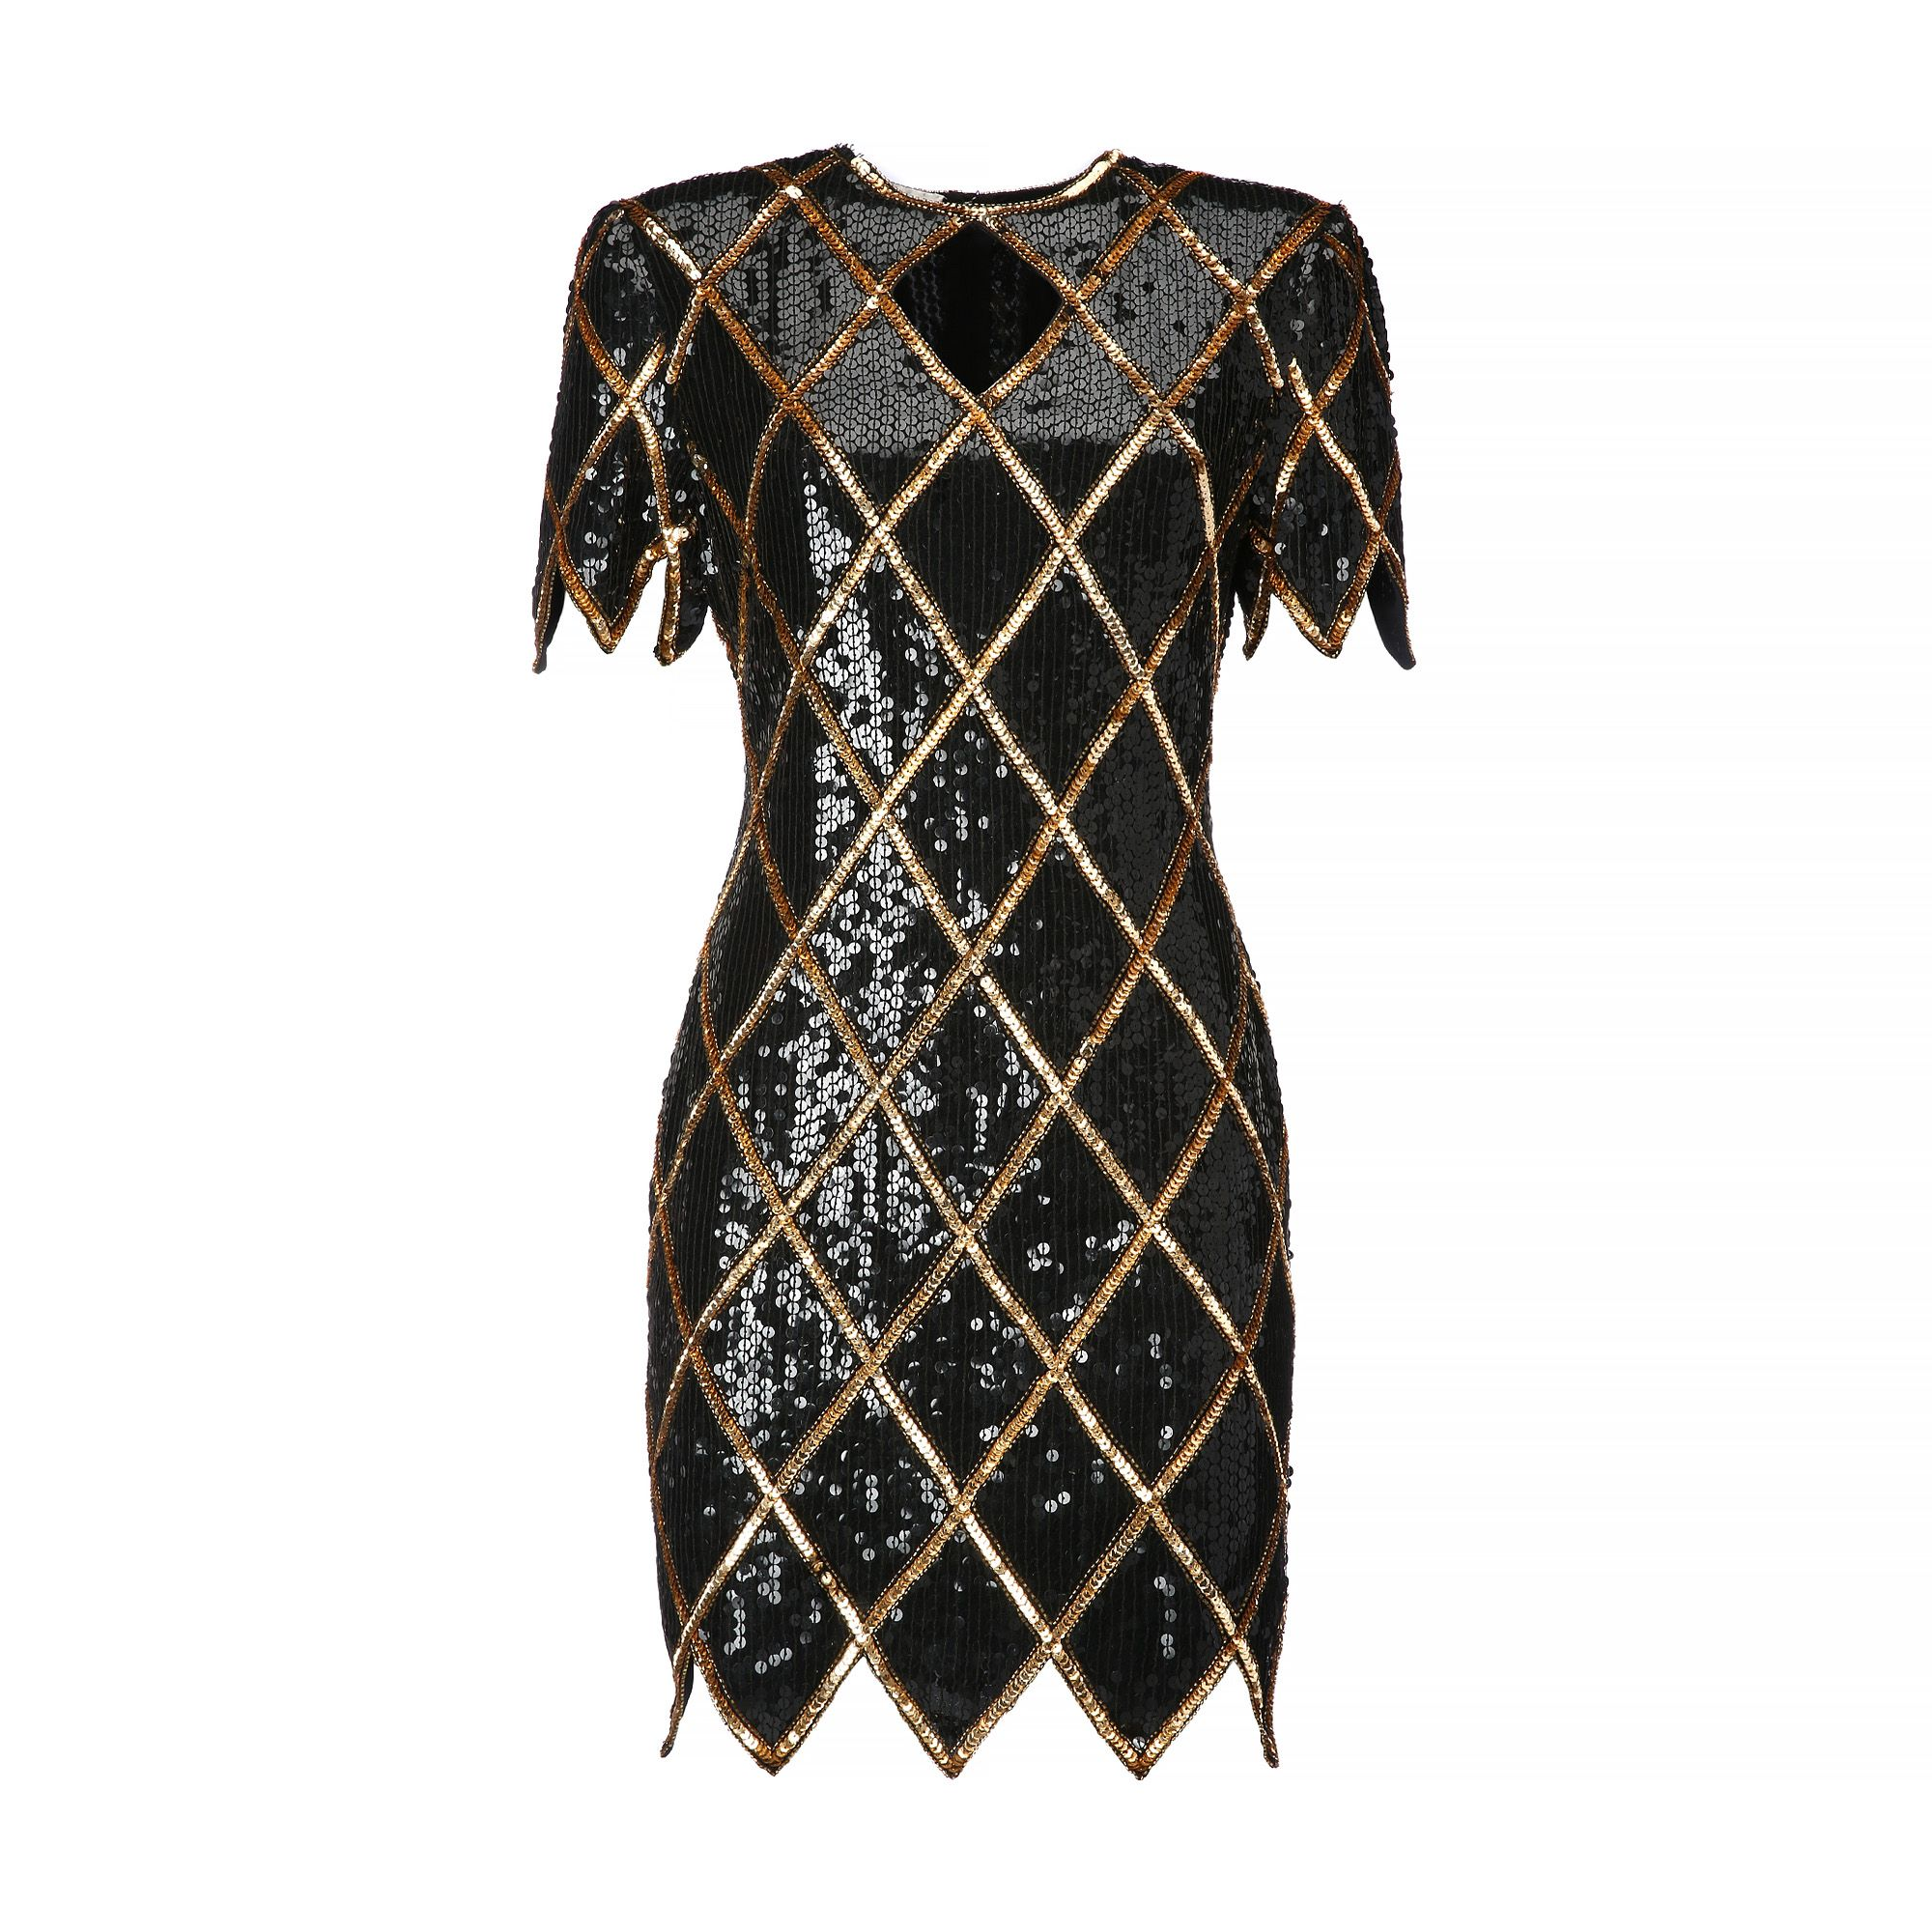 "<p><strong>La DoubleJ</strong> black and gold sequined dress, $420, <a href=""https://ladoublej.com/shop/dresses/black-gold-sequined-dress-1980s/"" target=""_blank"">ladoublej.com</a>. </p>"